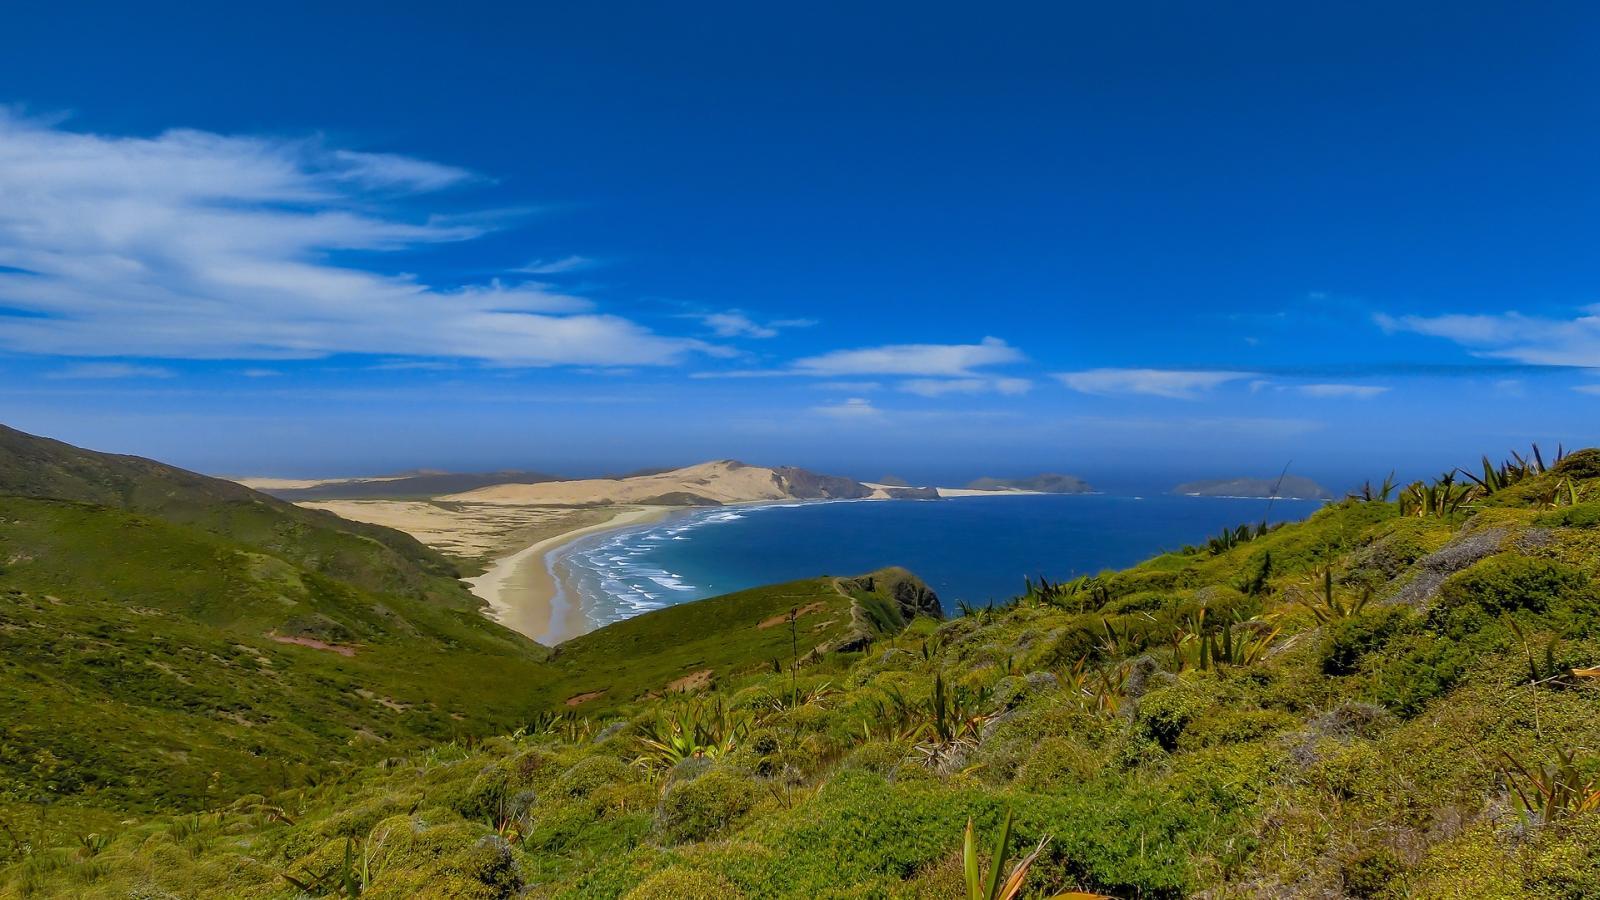 PhotoFly Travel Club | new zealand north island featured image | PhotoFly Travel Club